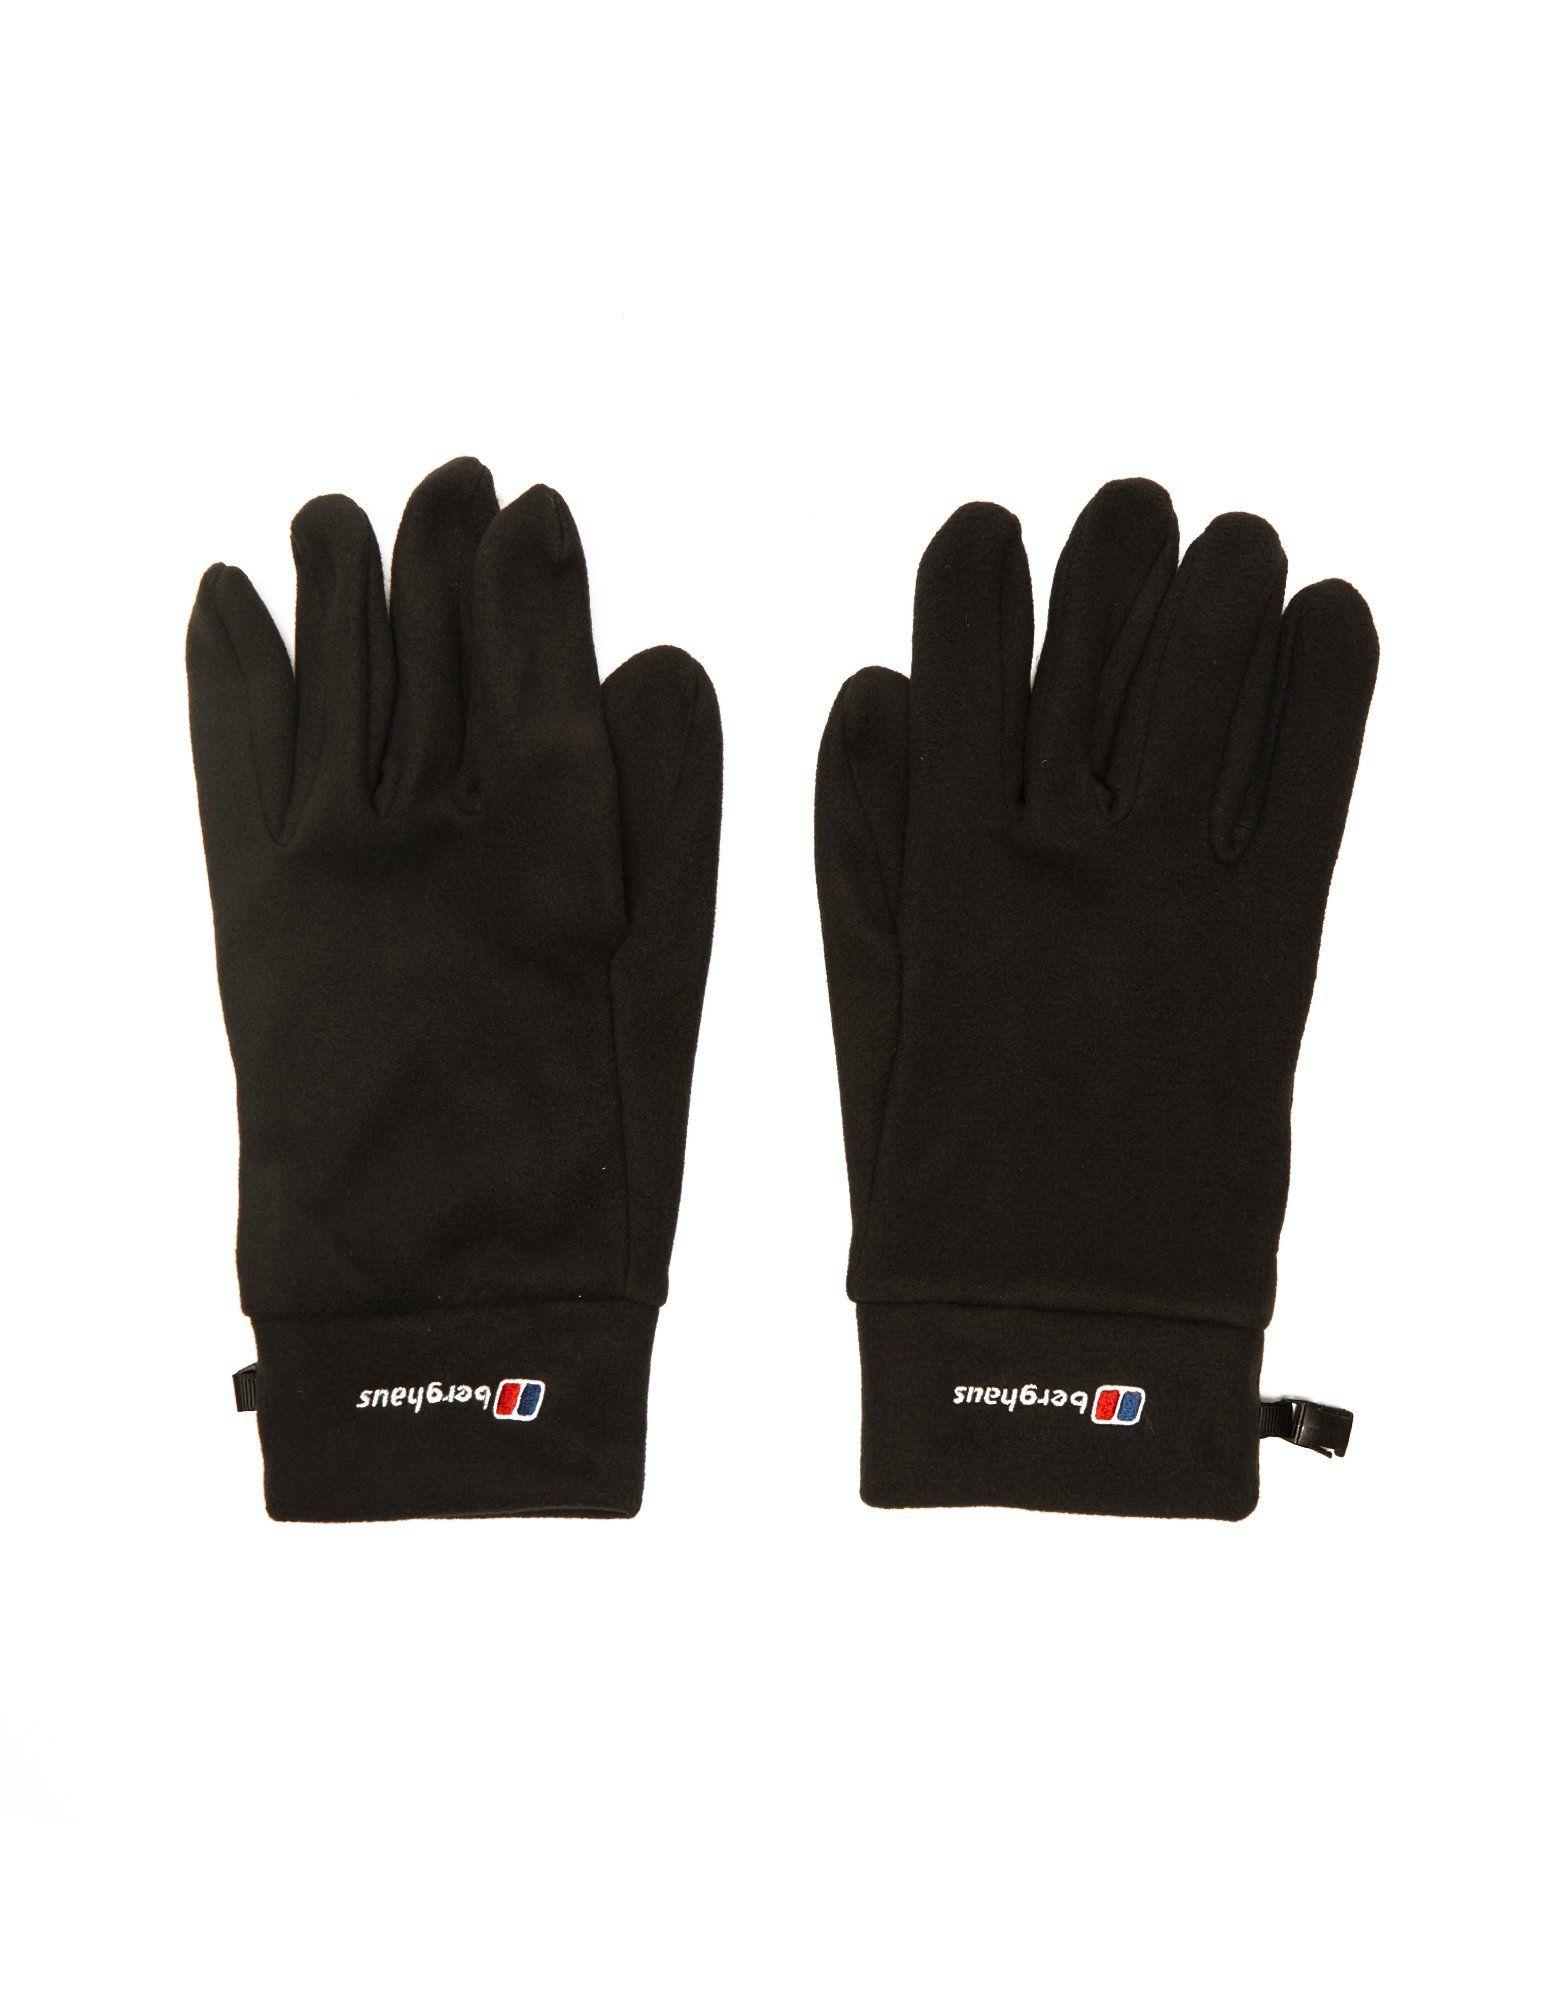 Mens leather gloves ireland - Berghaus Spectrum Gloves Berghaus Spectrum Gloves